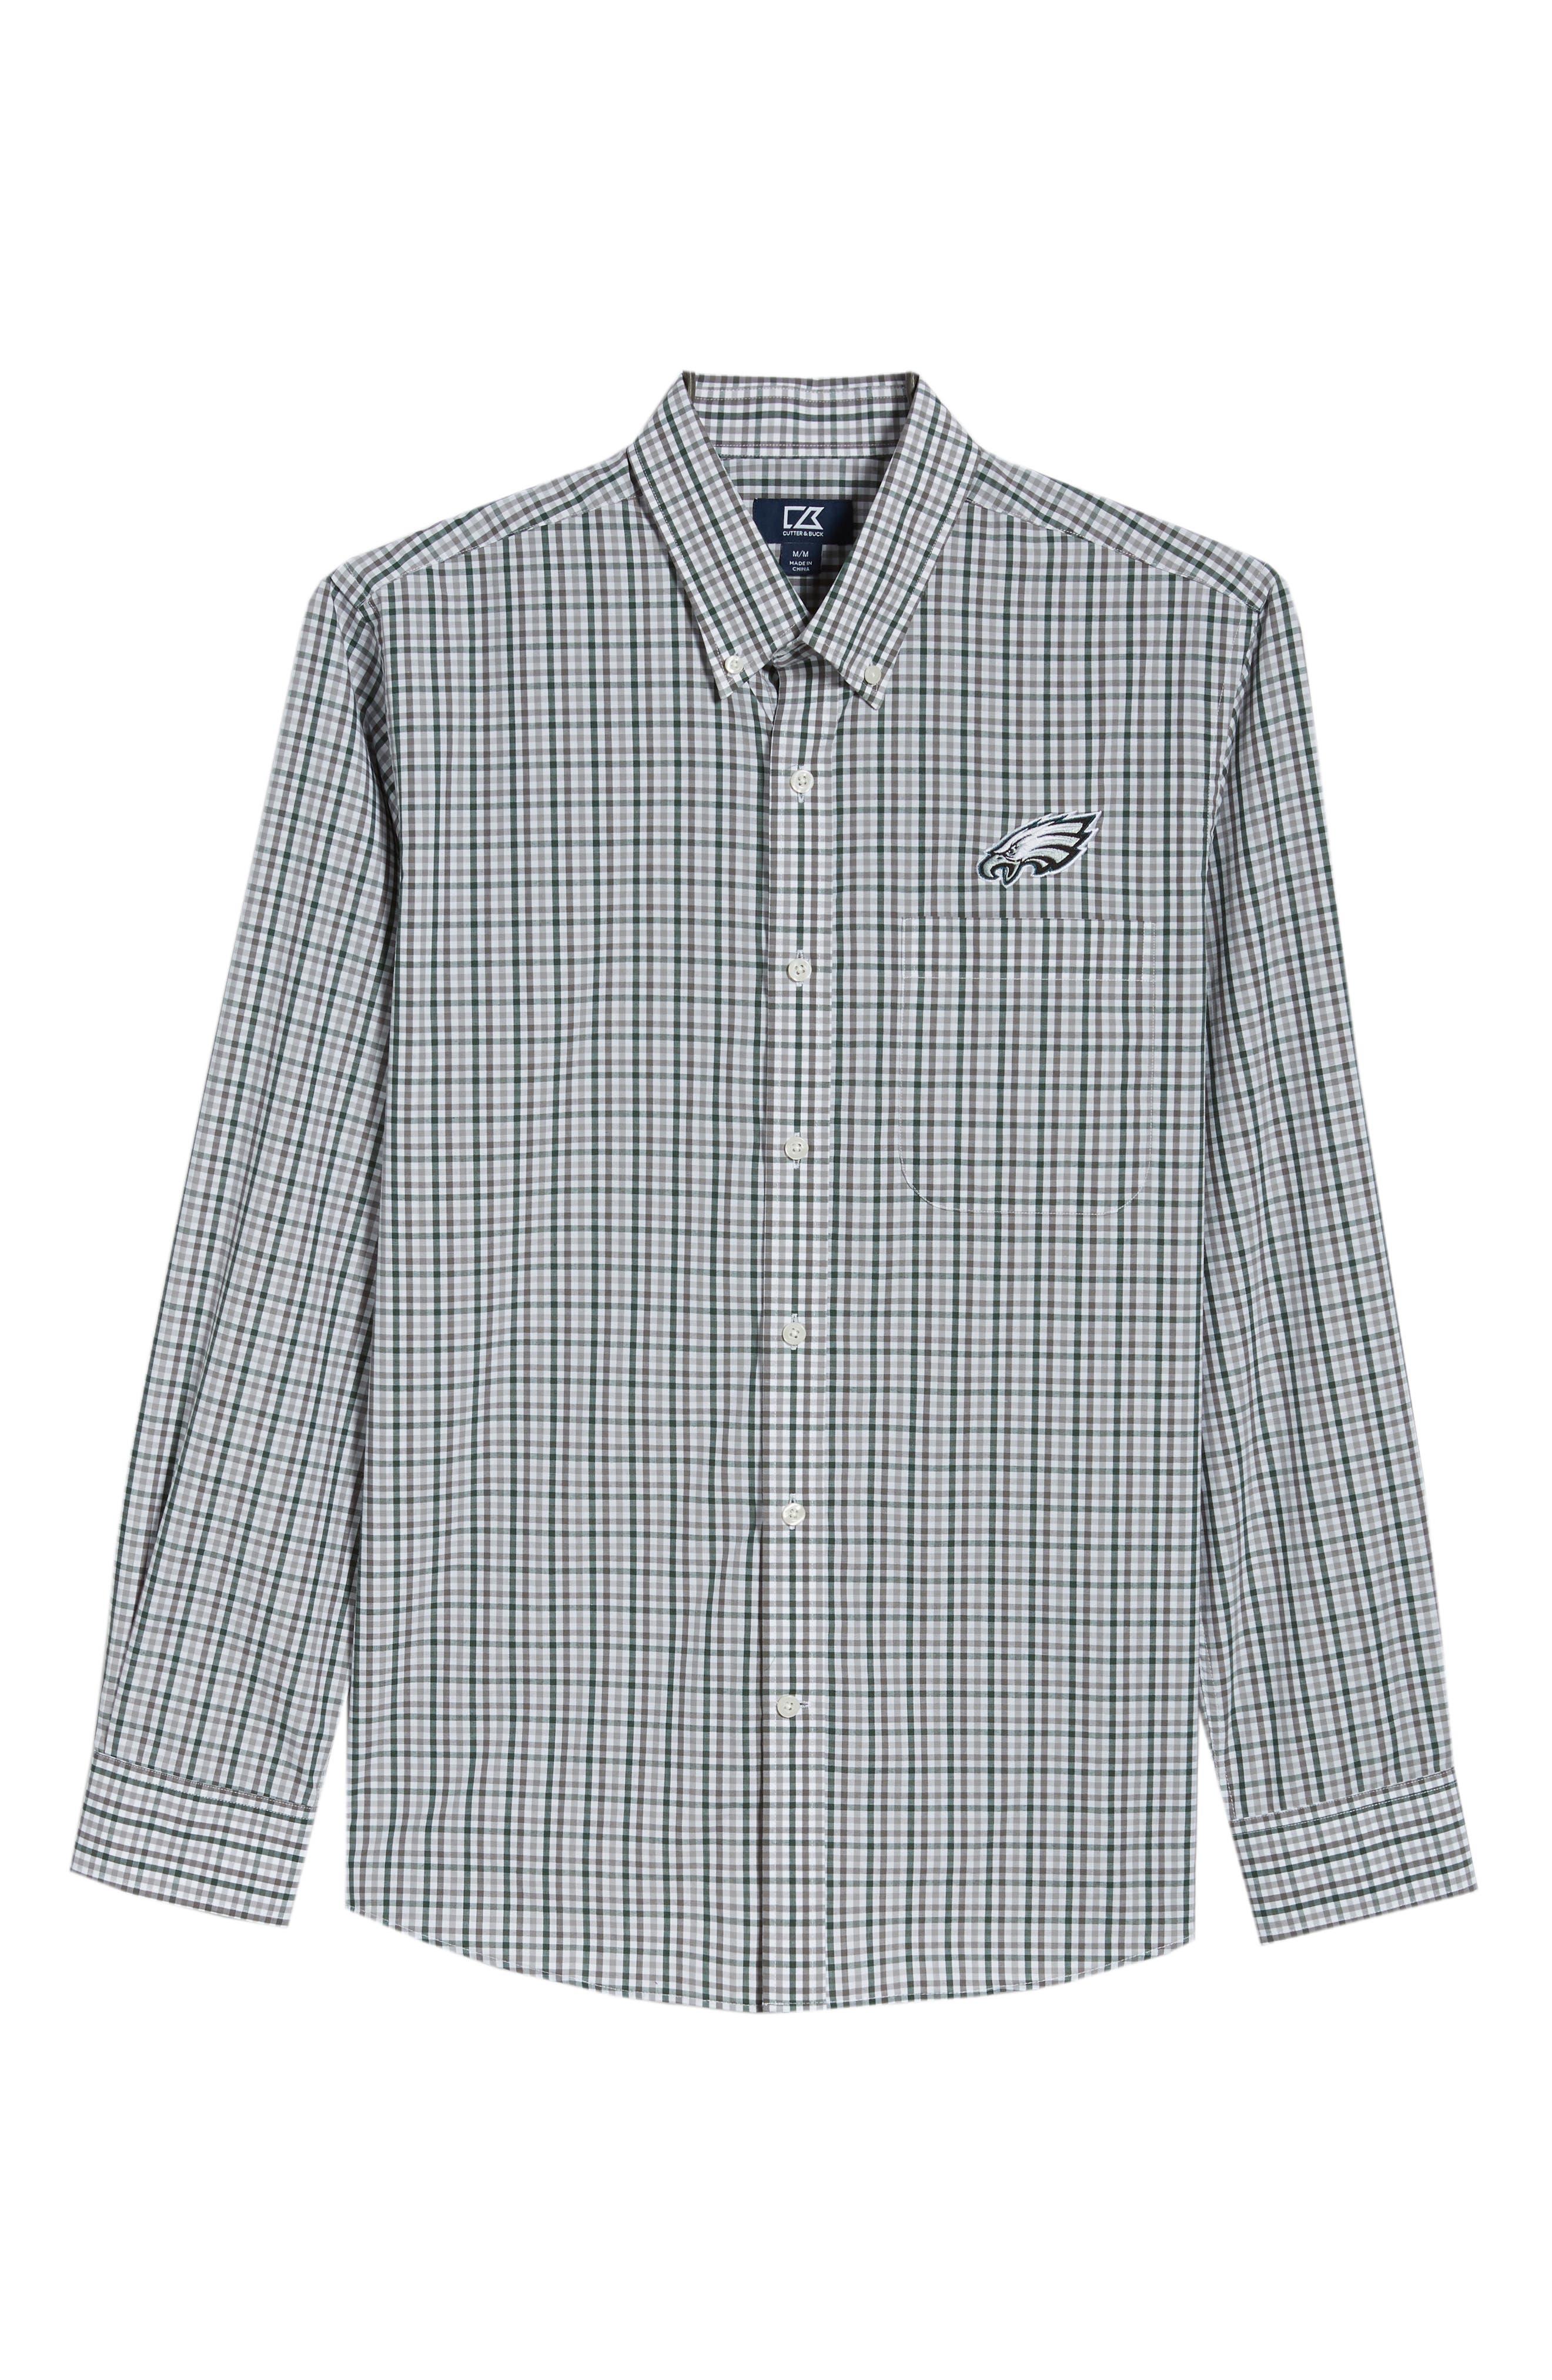 Philadelphia Eagles - Gilman Regular Fit Plaid Sport Shirt,                             Alternate thumbnail 6, color,                             377